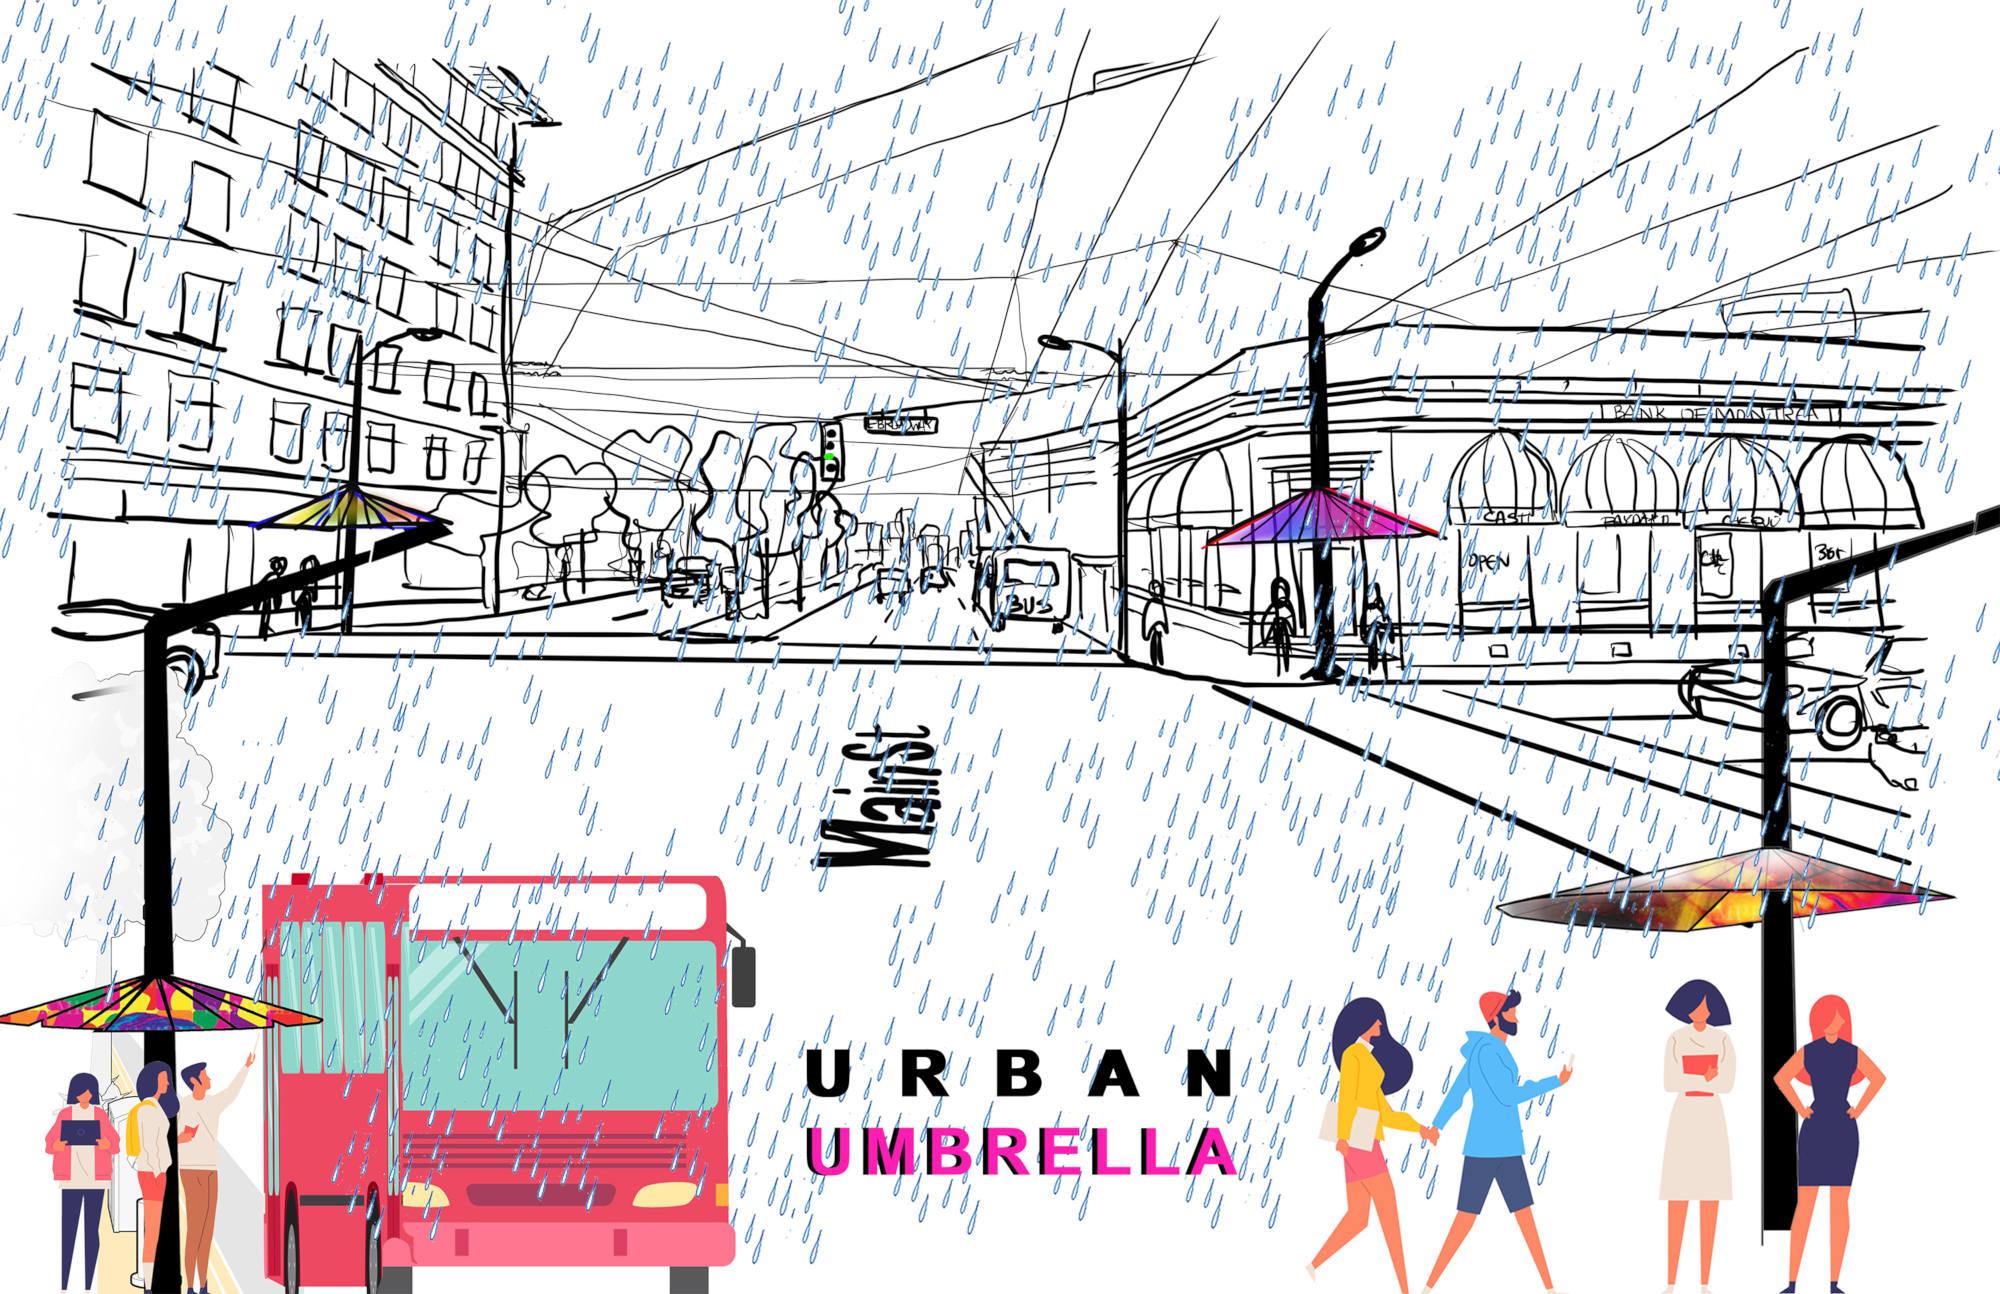 B8 - Urban Umbrellas - Image 2 - 11.jpg